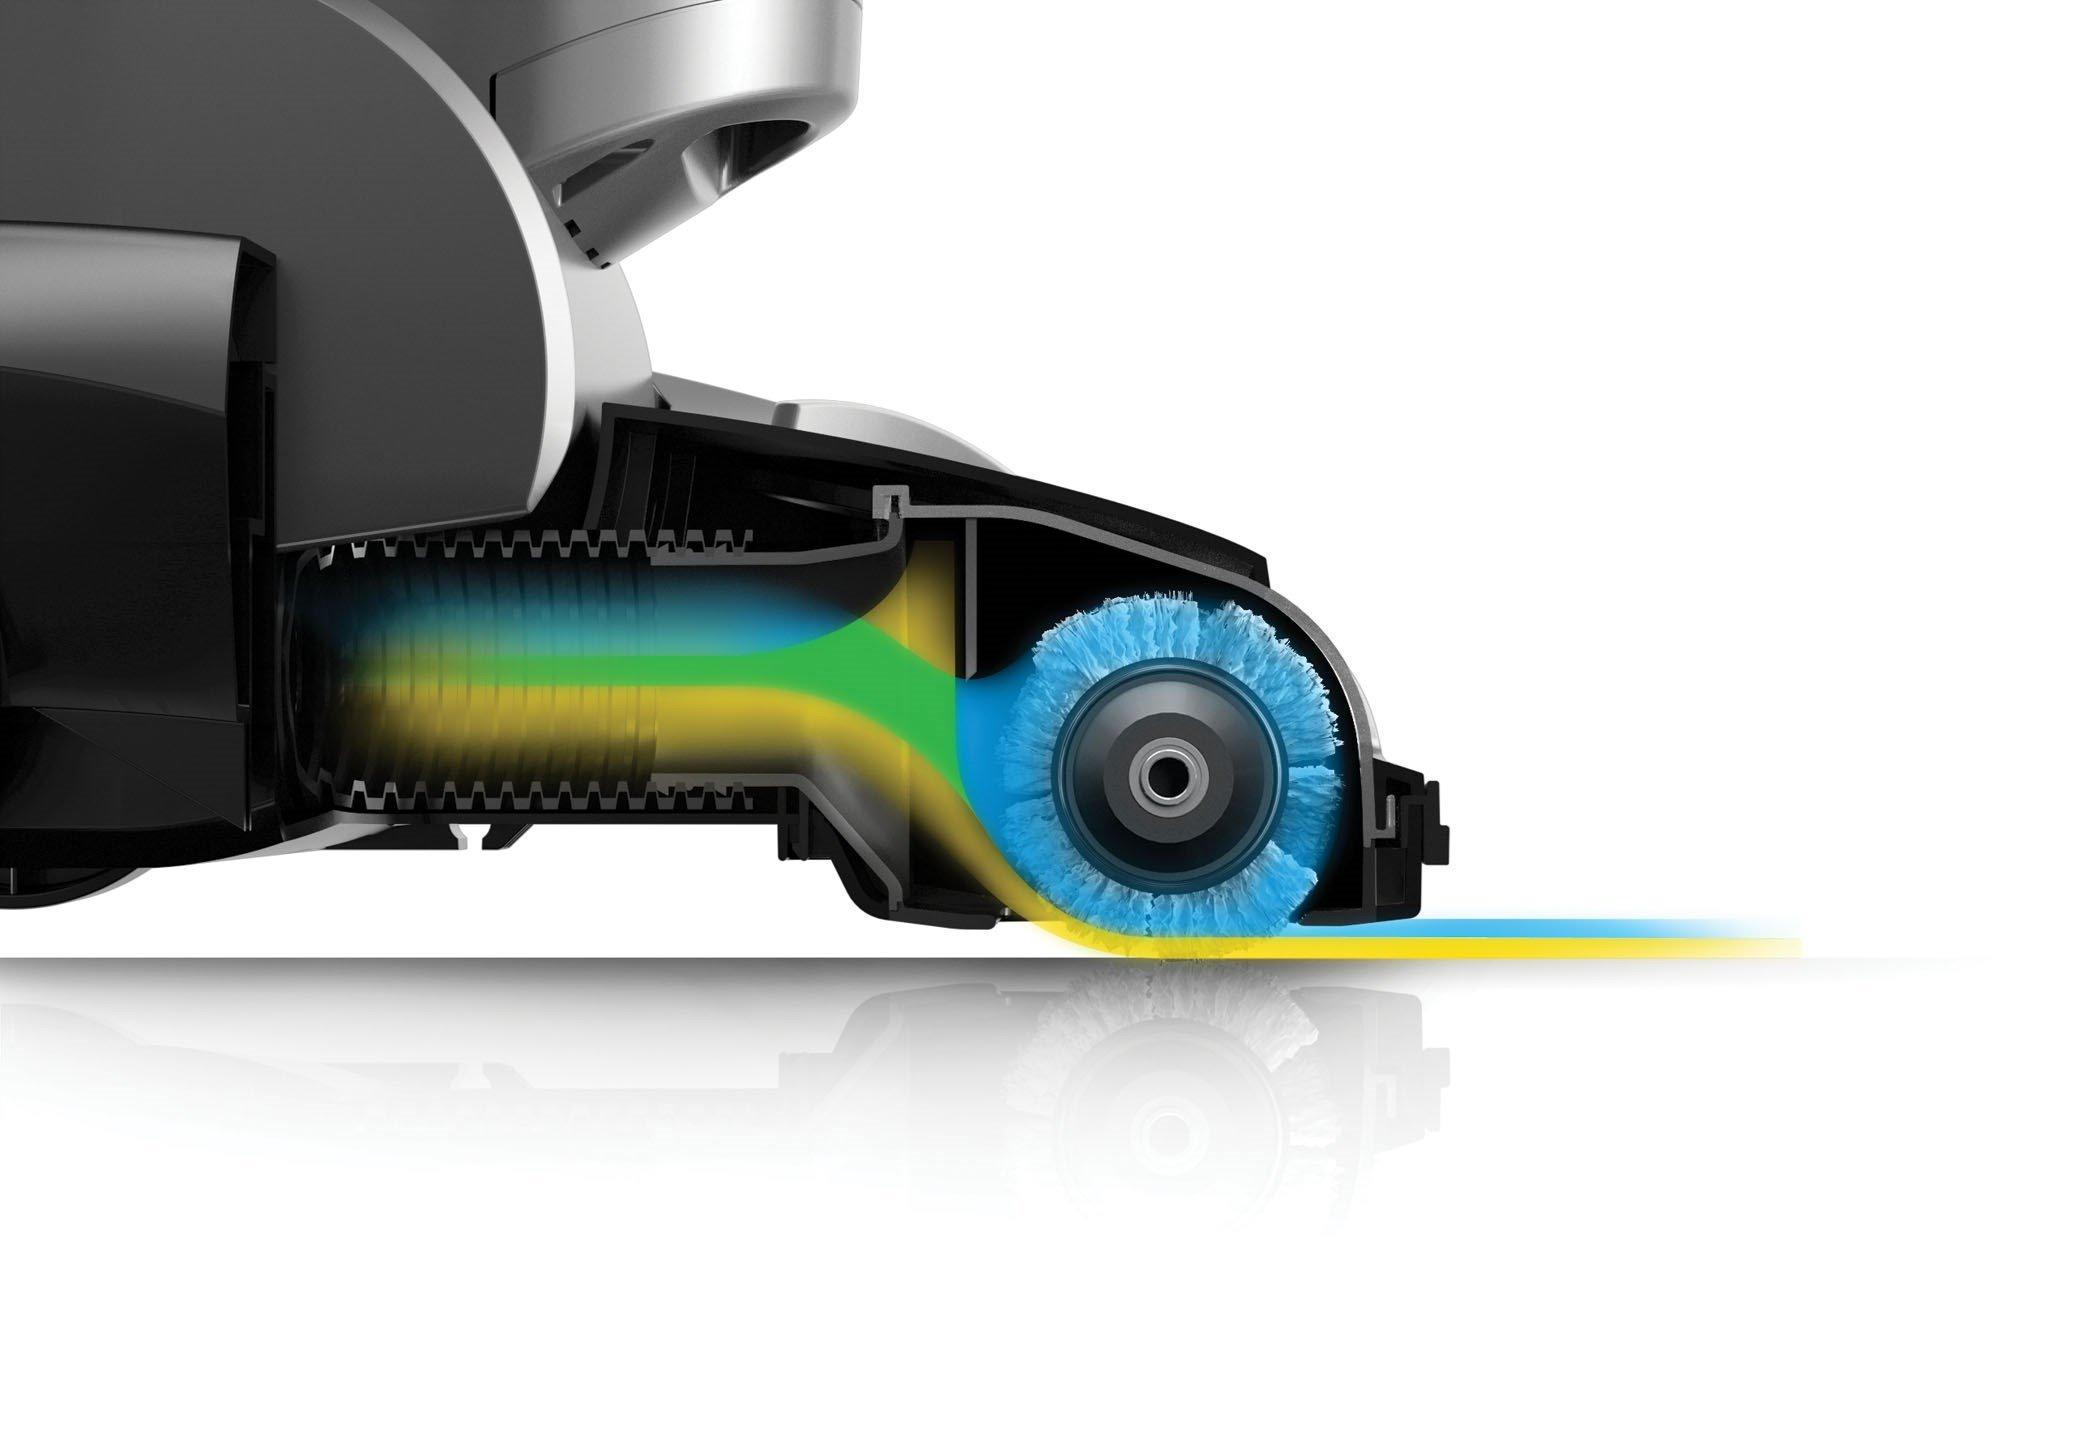 Reconditioned WindTunnel 2 Rewind Upright Vacuum7